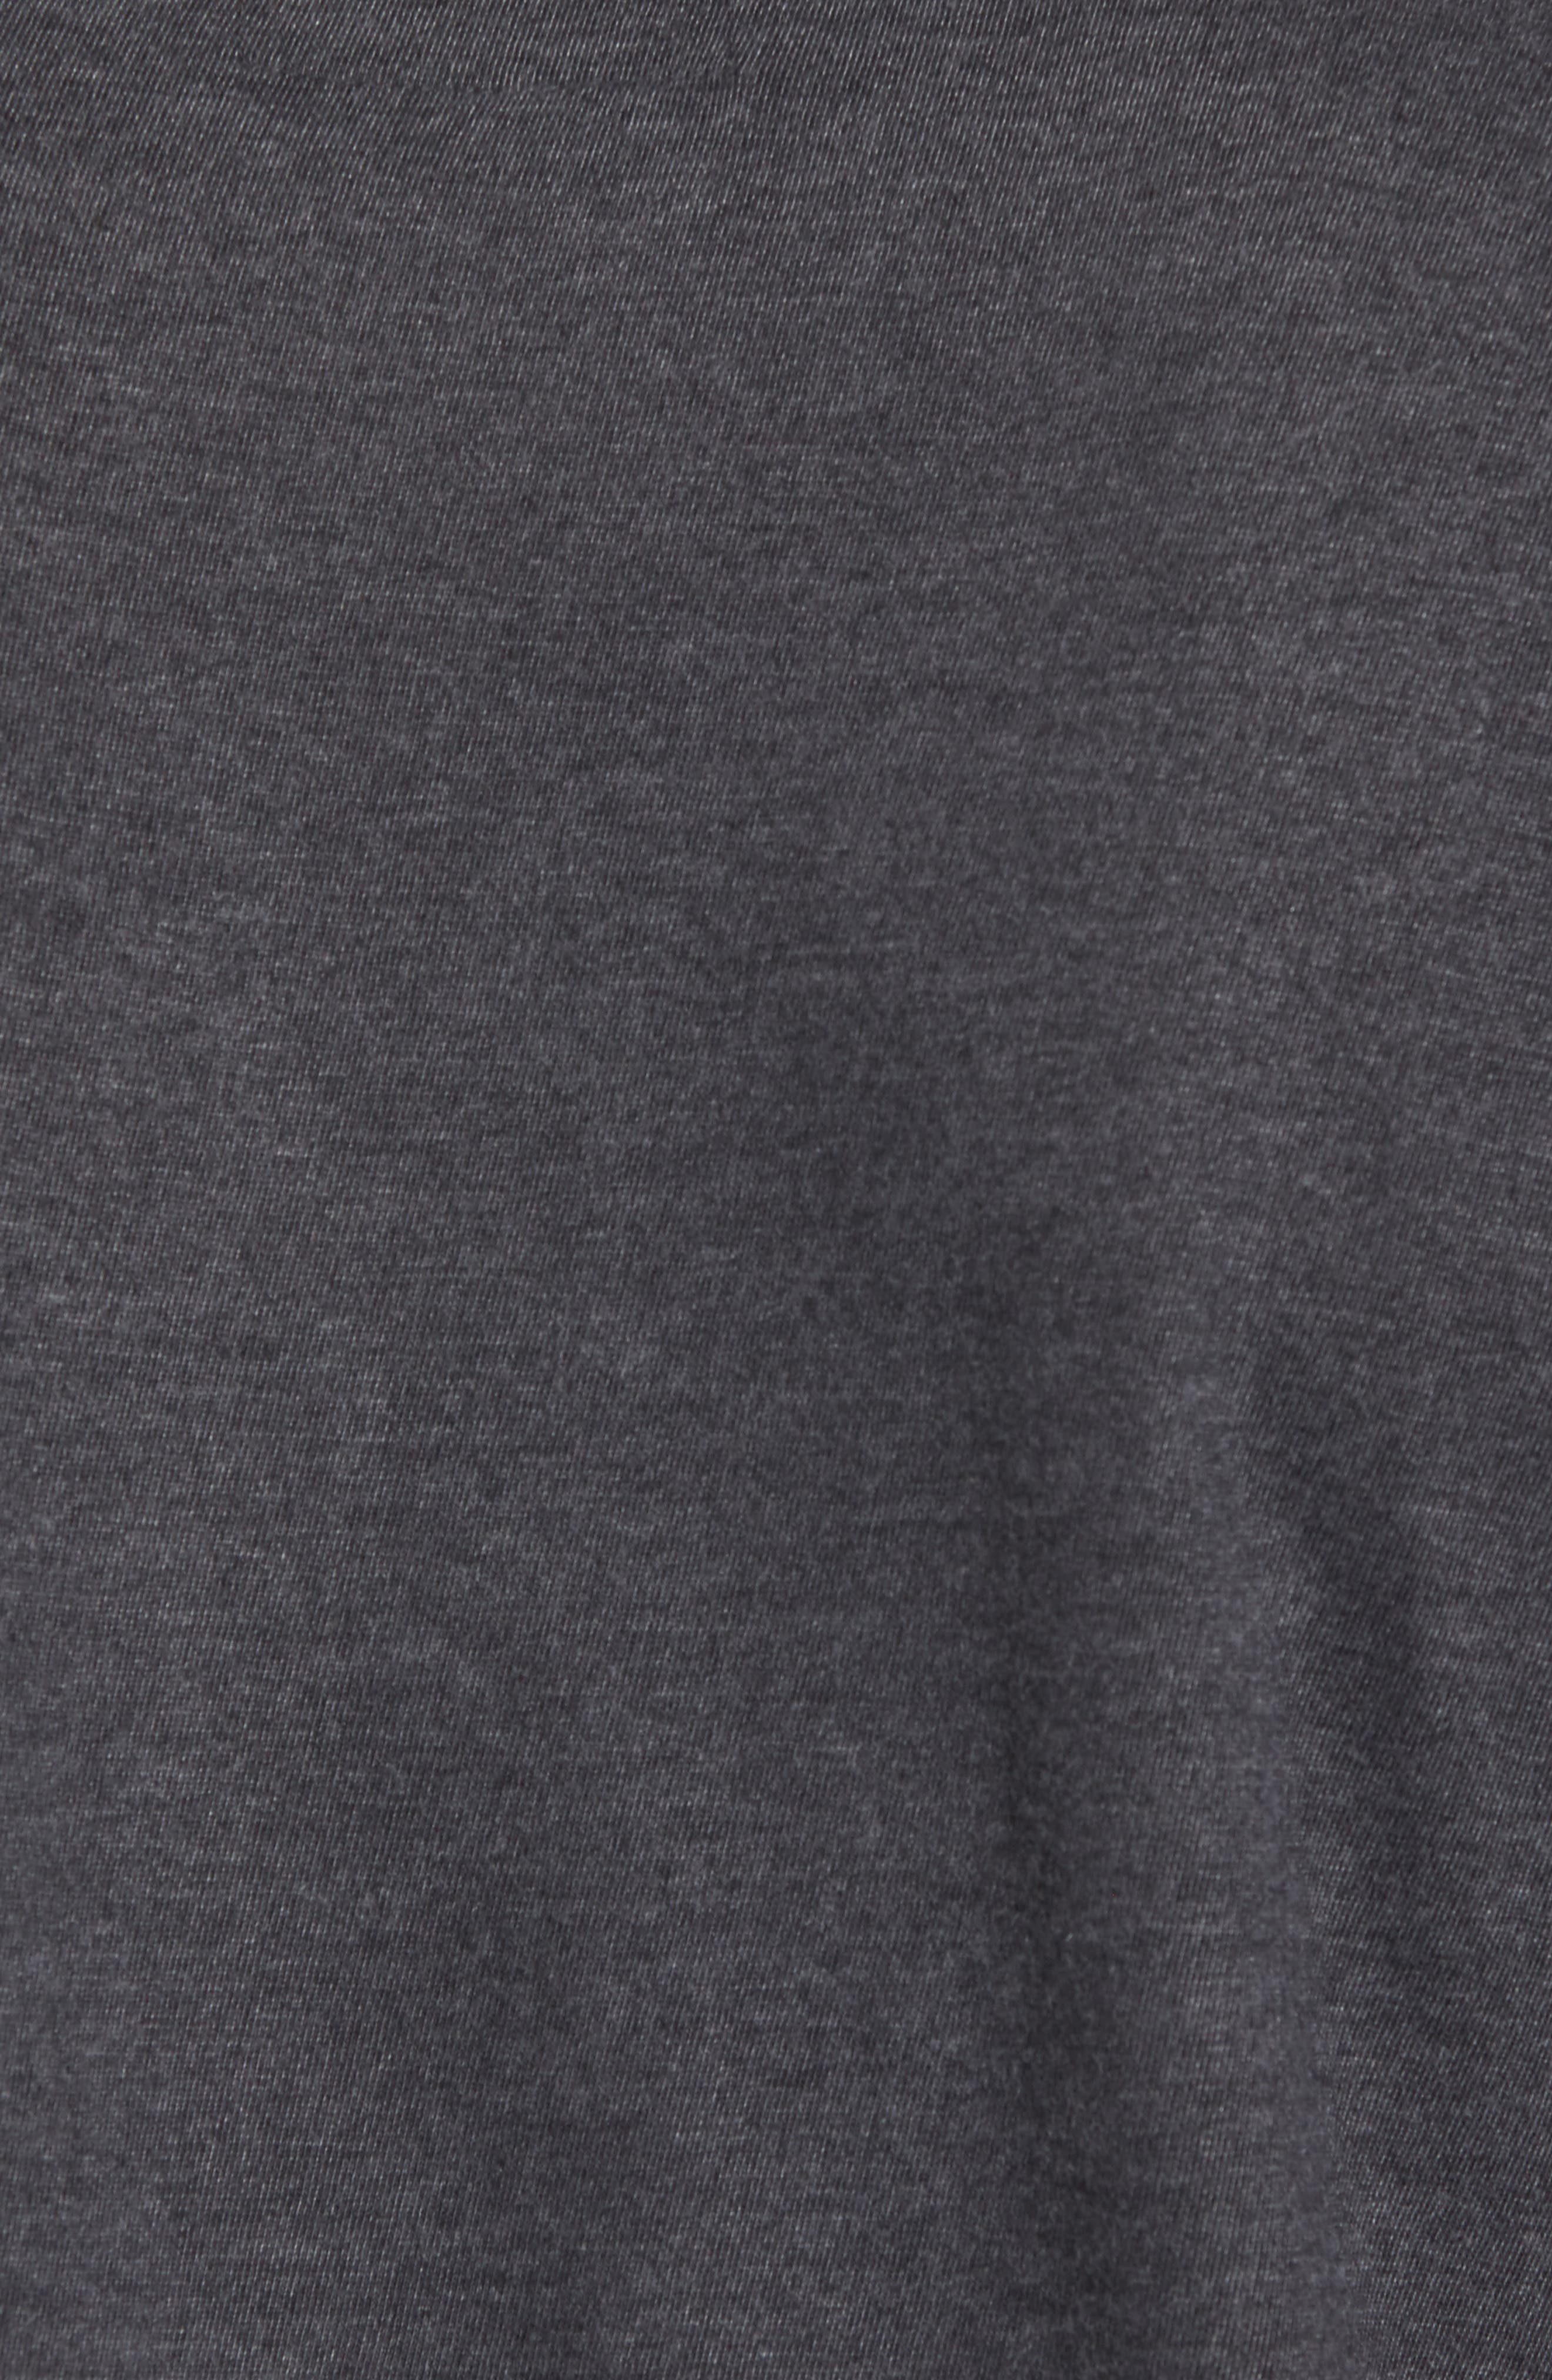 Hillwood Penguins T-Shirt,                             Alternate thumbnail 5, color,                             Heather Black